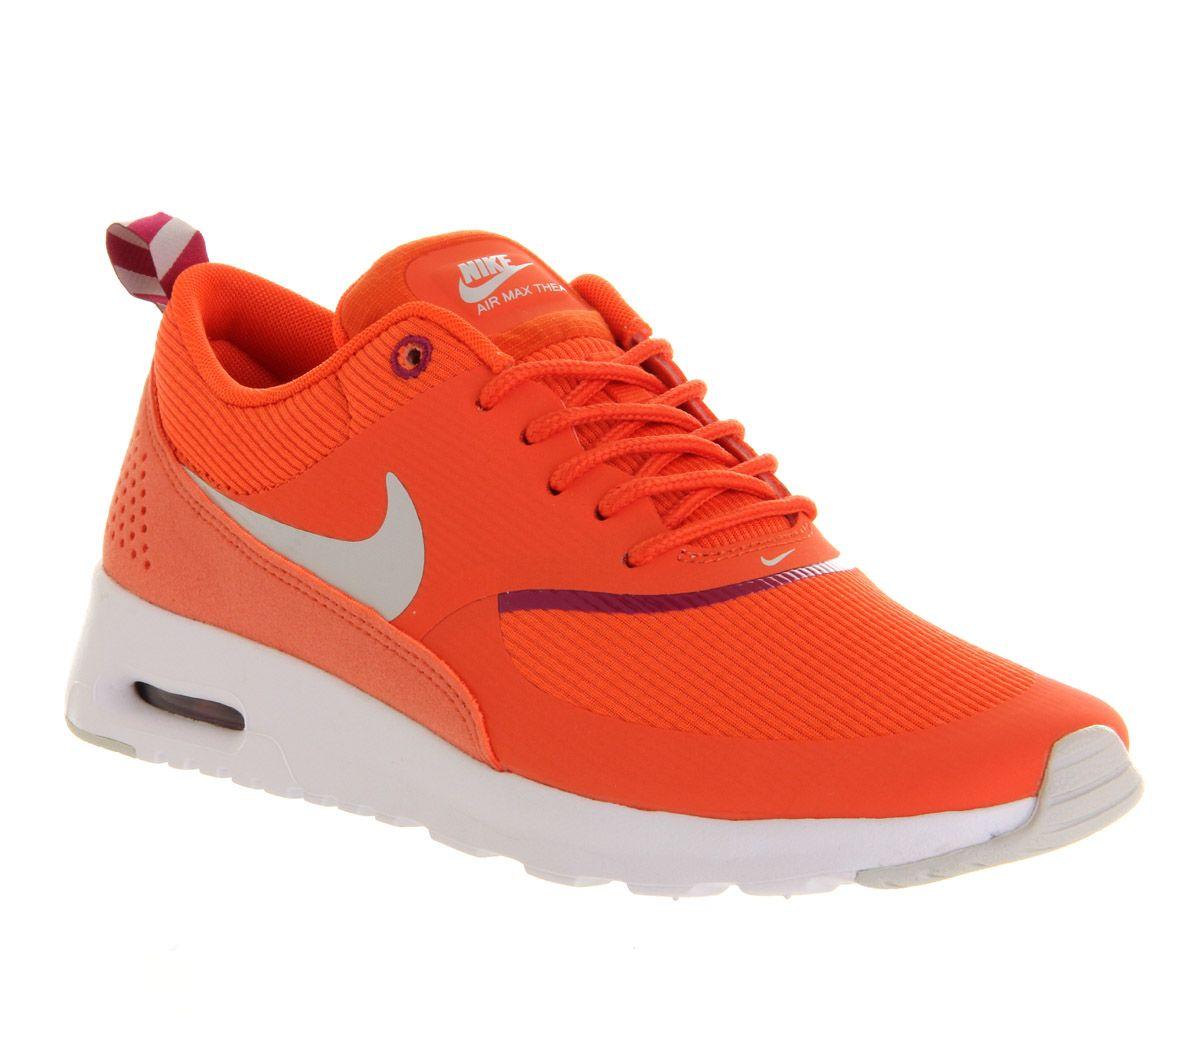 Air Max Thea | Nike air max, Air max thea, Nike